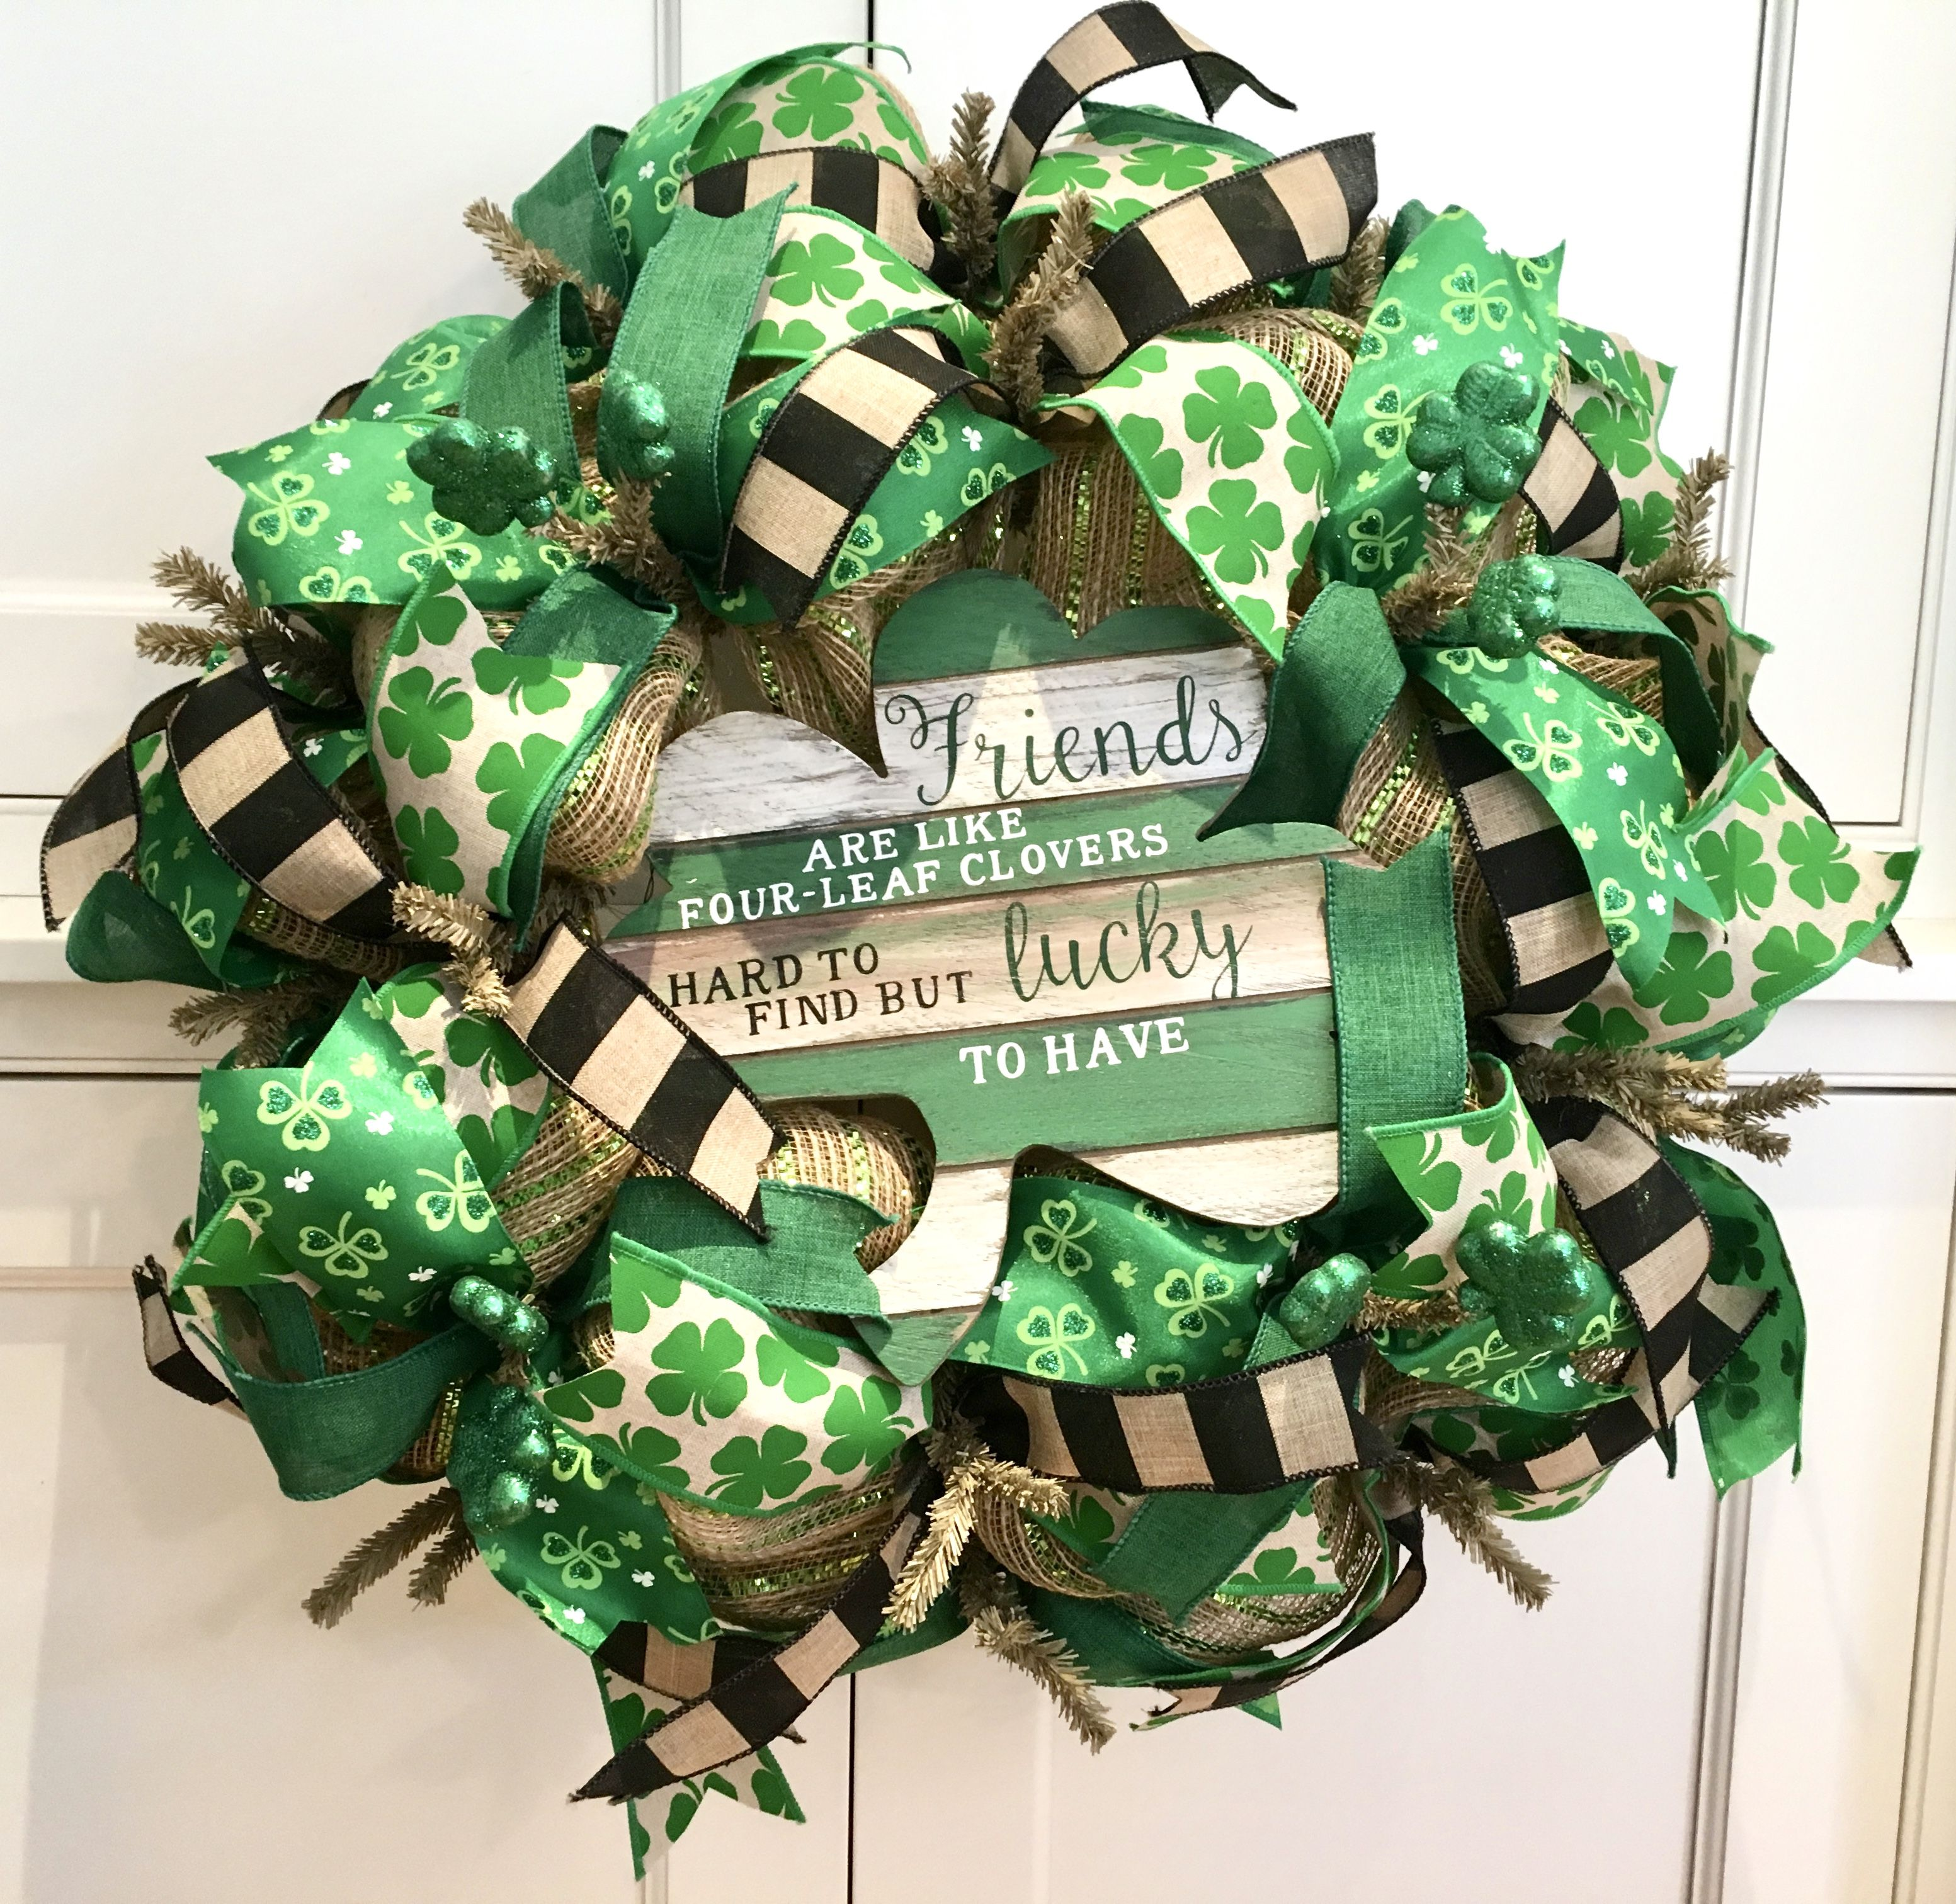 Handmade wreath celebrating St. Patrick's Day! This wreath